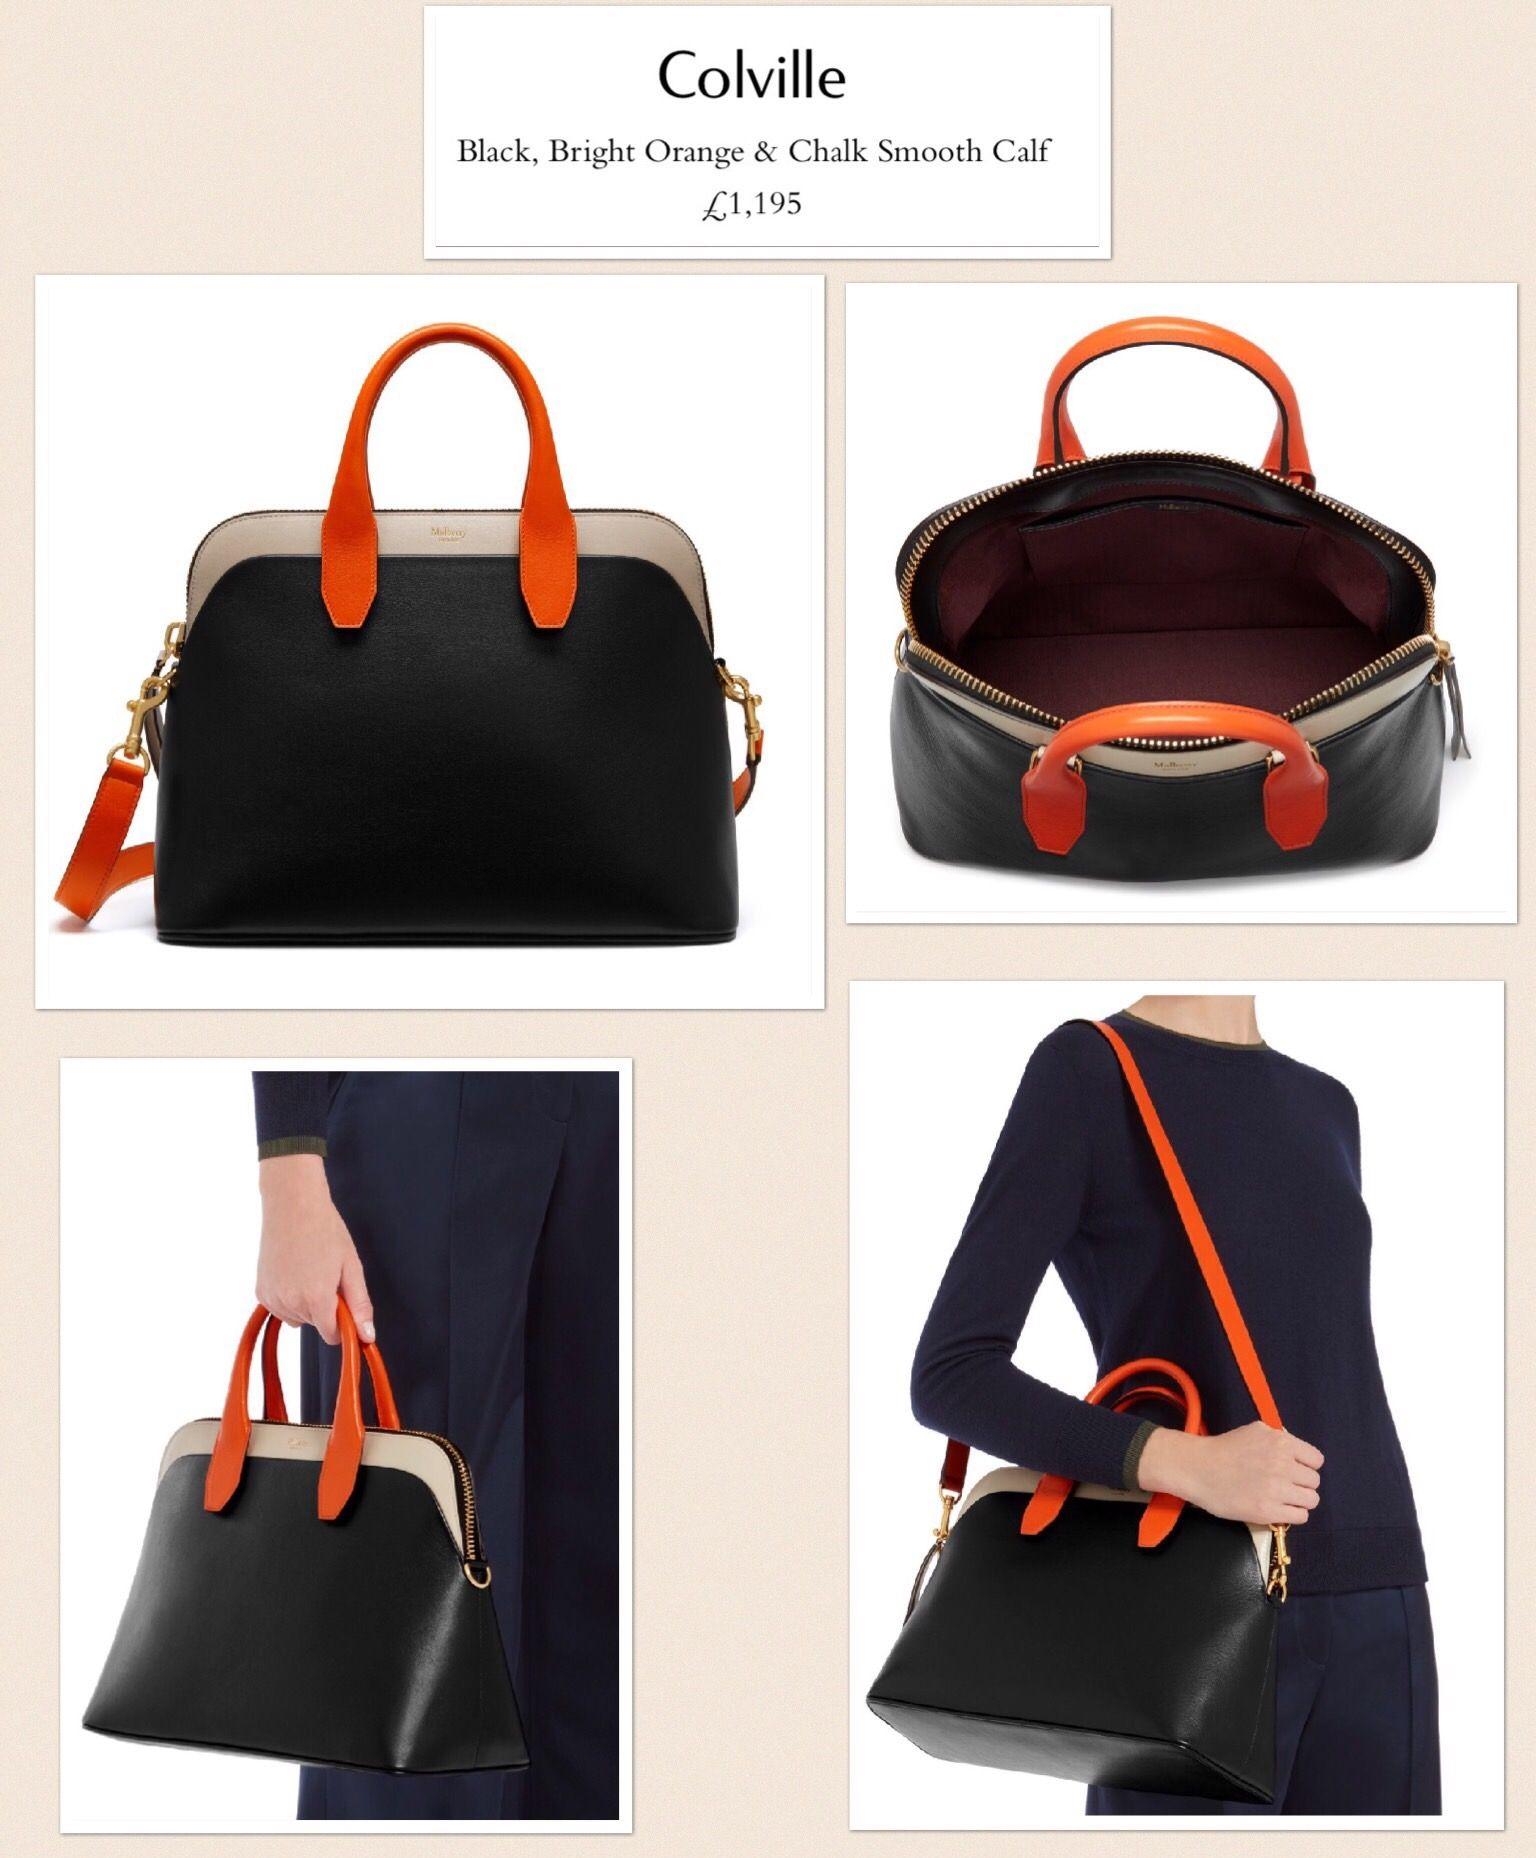 Mulberry Colville Black, Bright Orange and Chalk Smooth Calf. SS17. RRP  £1.195. 27x38x19 cm. Handle drop 10 cm. Strap 40 cm. 2b6e7b33af